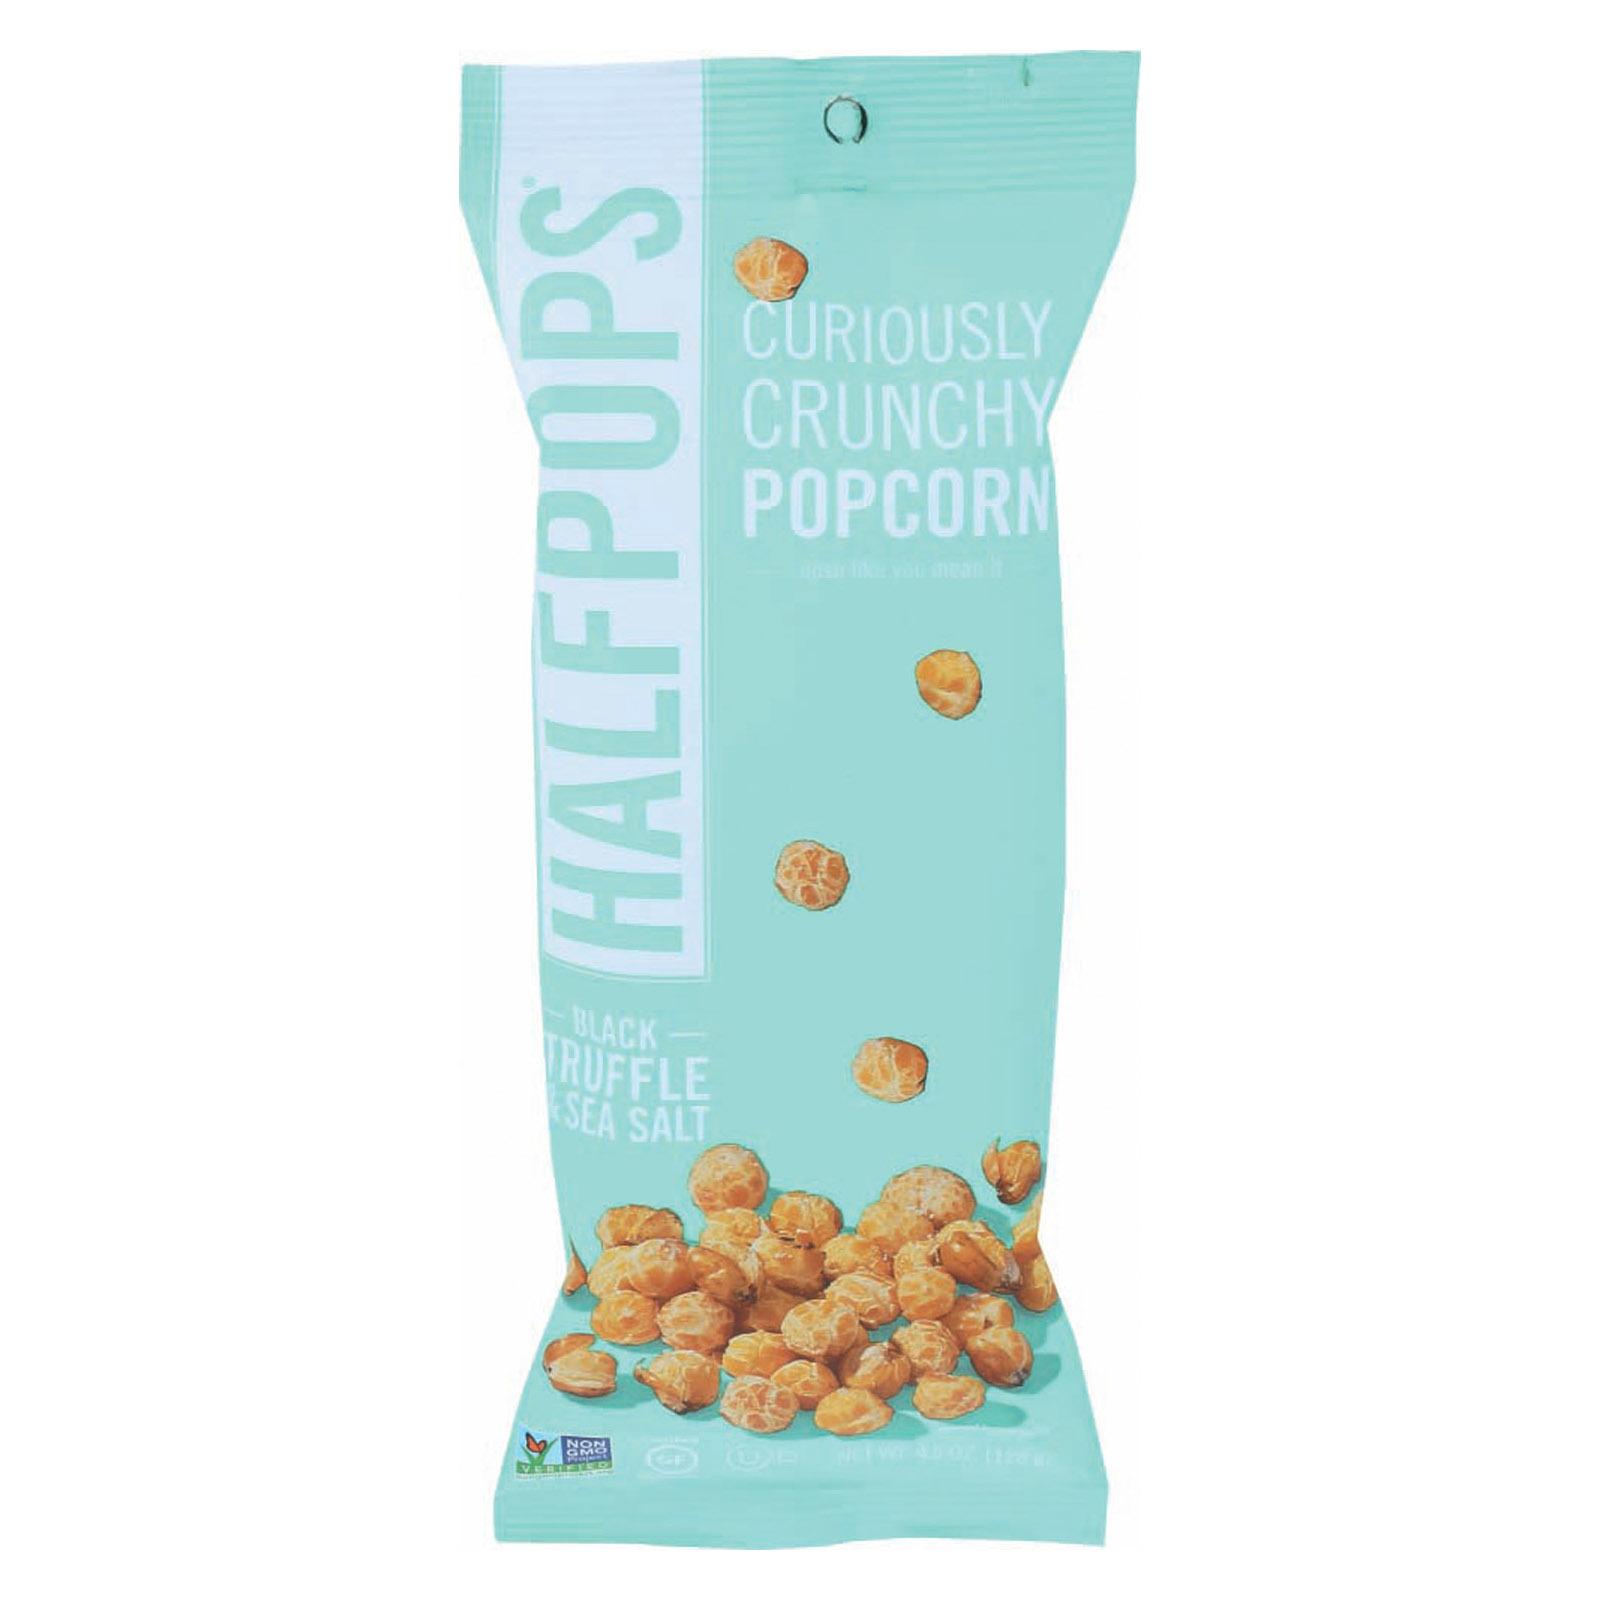 Halfpops Popcorn - Black Truffle & Sea Salt - Case of 12 - 4.5 oz